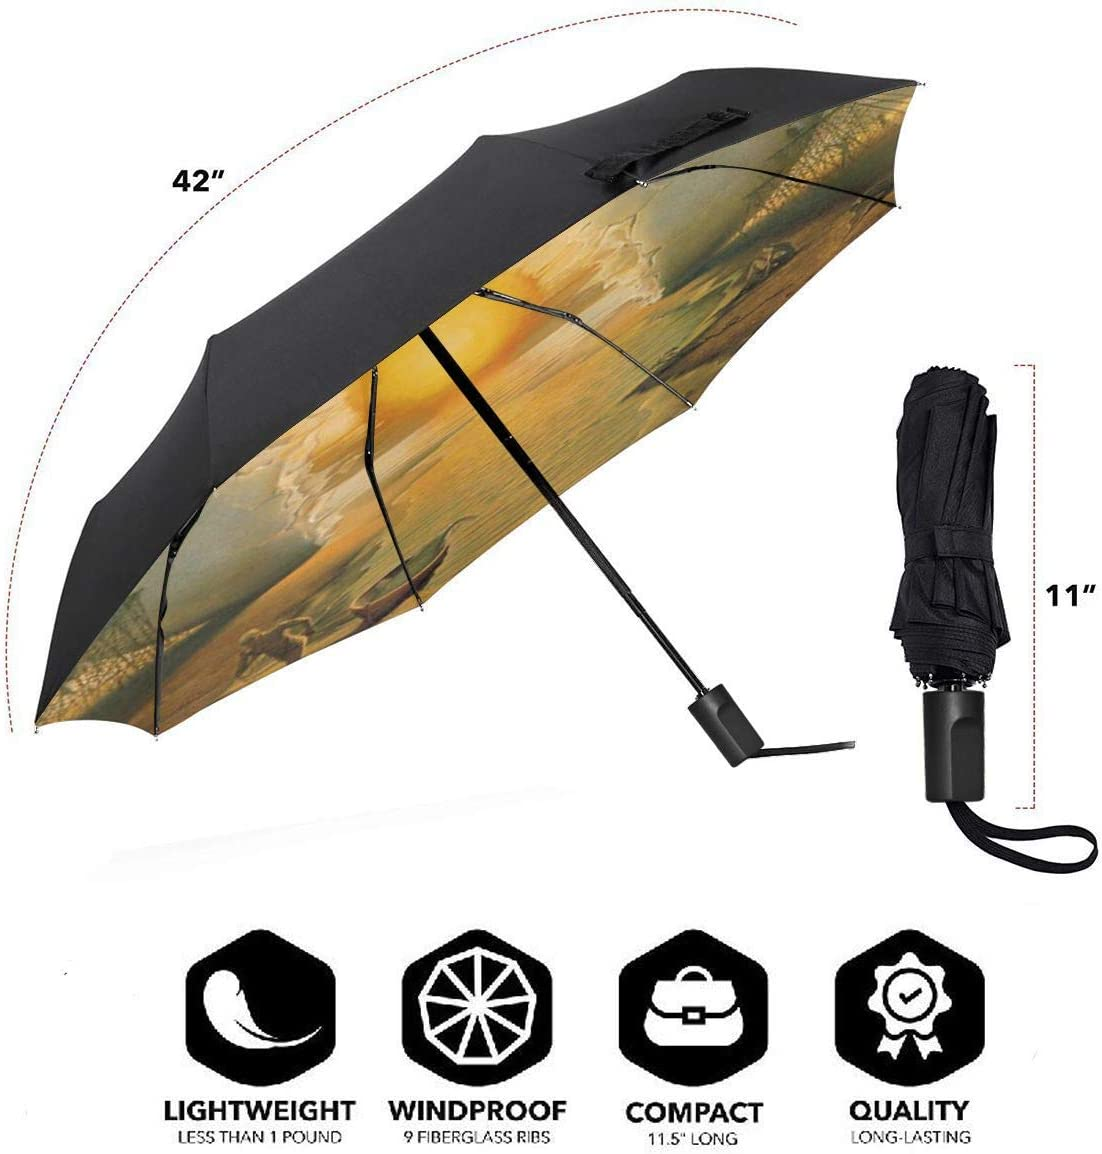 Egg Sunset MMLCGG Lightweight Portable Sun/&Rain Travel Umbrella